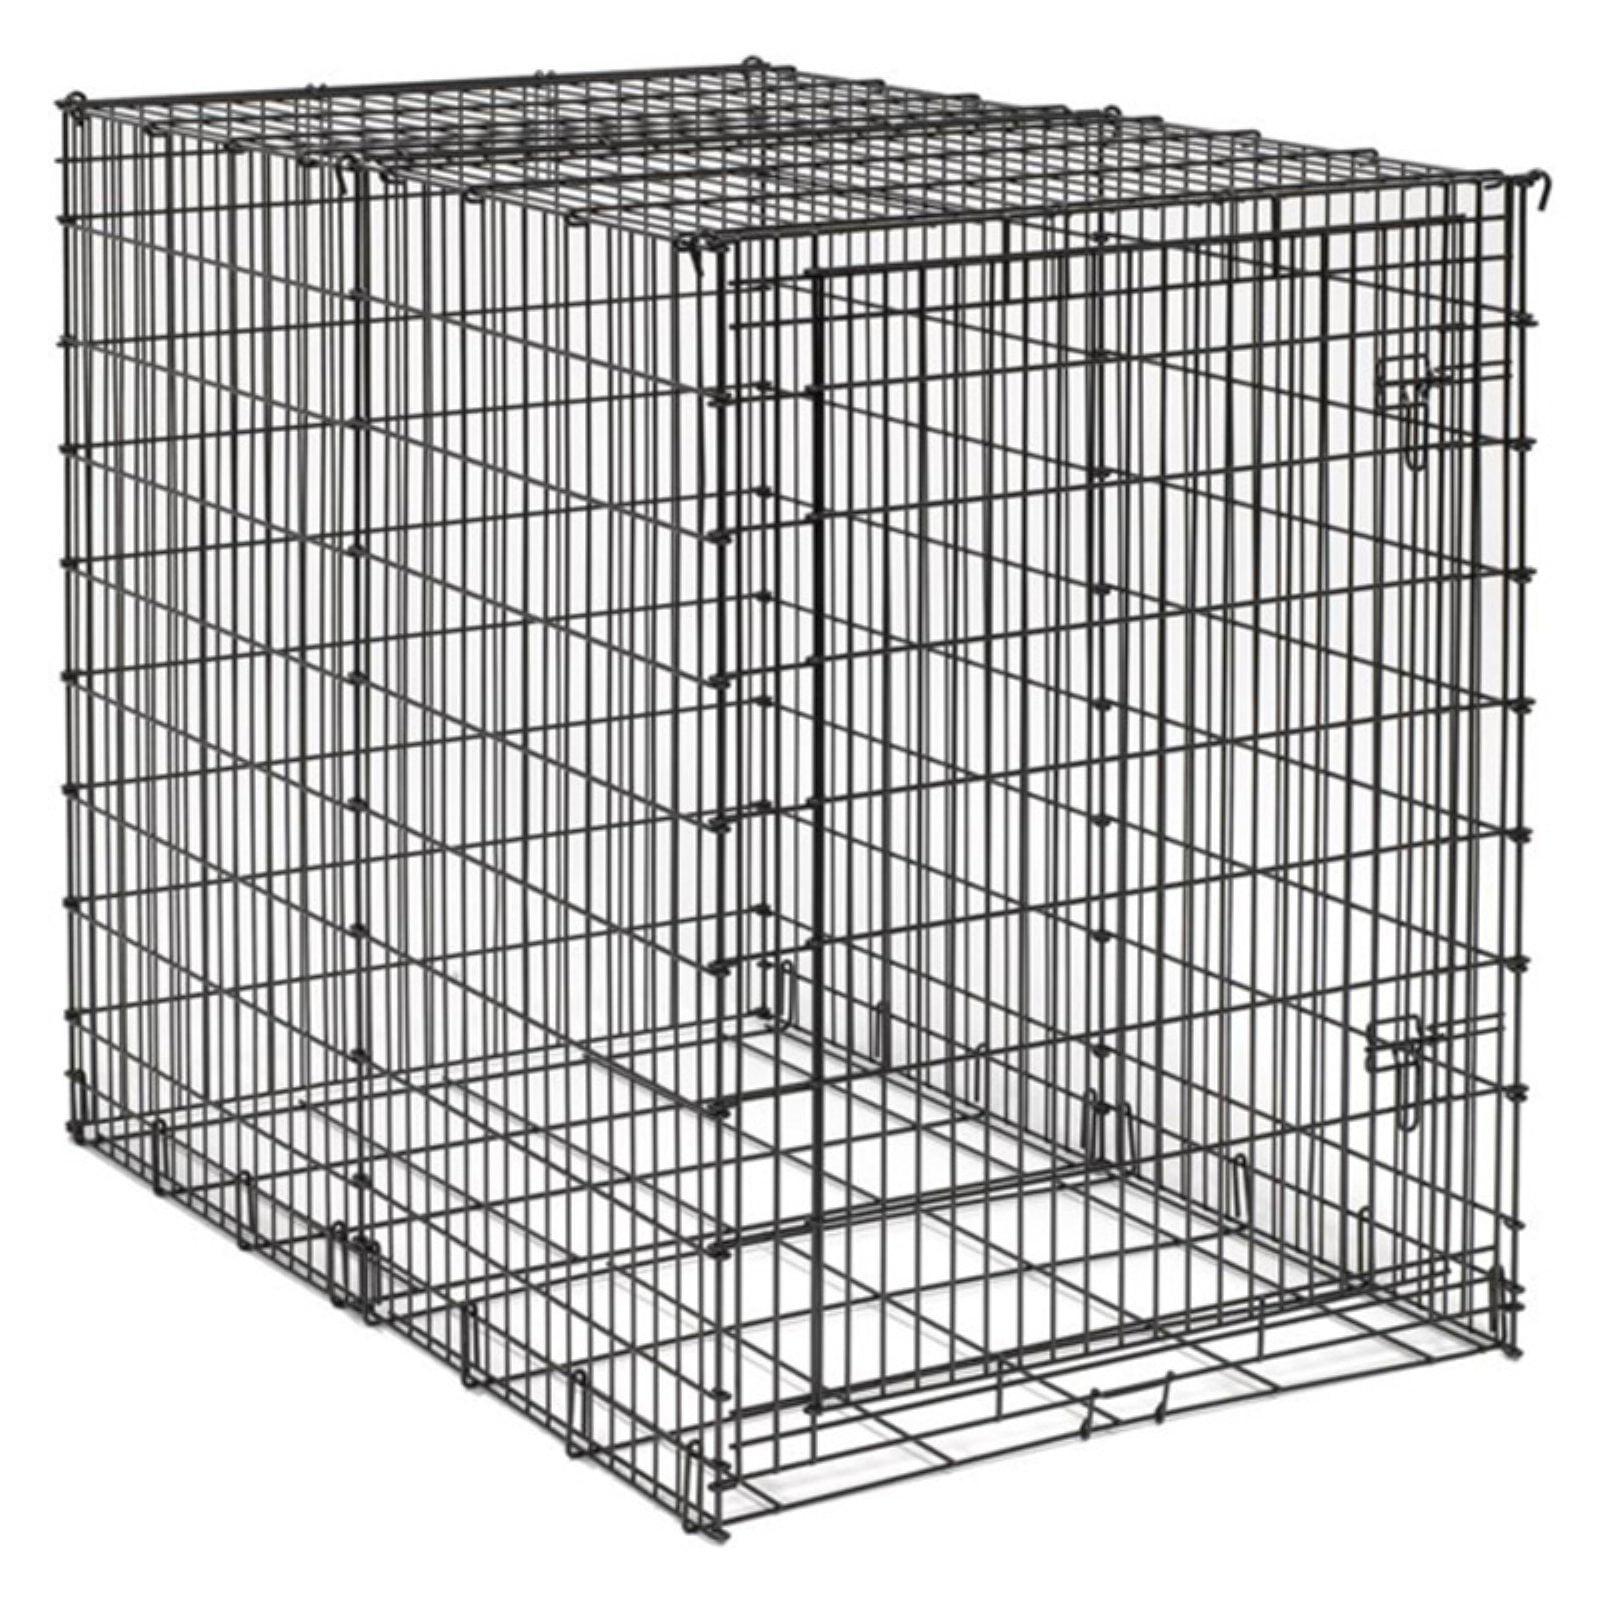 "Midwest Big Dog Crate, Black, 54"" x 35"" x 45"""